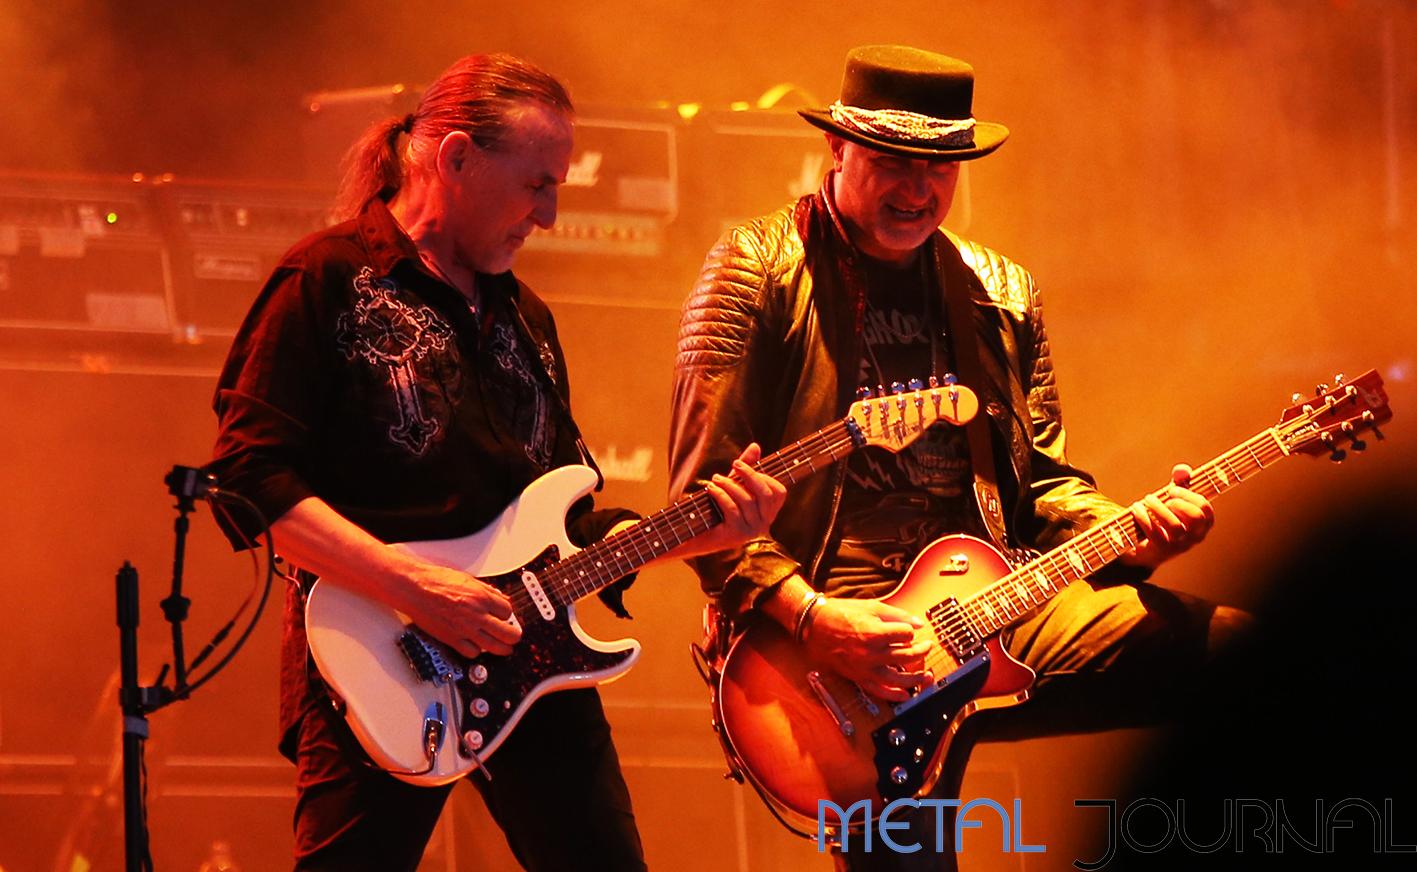 krokus - metal journal rock fest barcelona 2019 pic 3